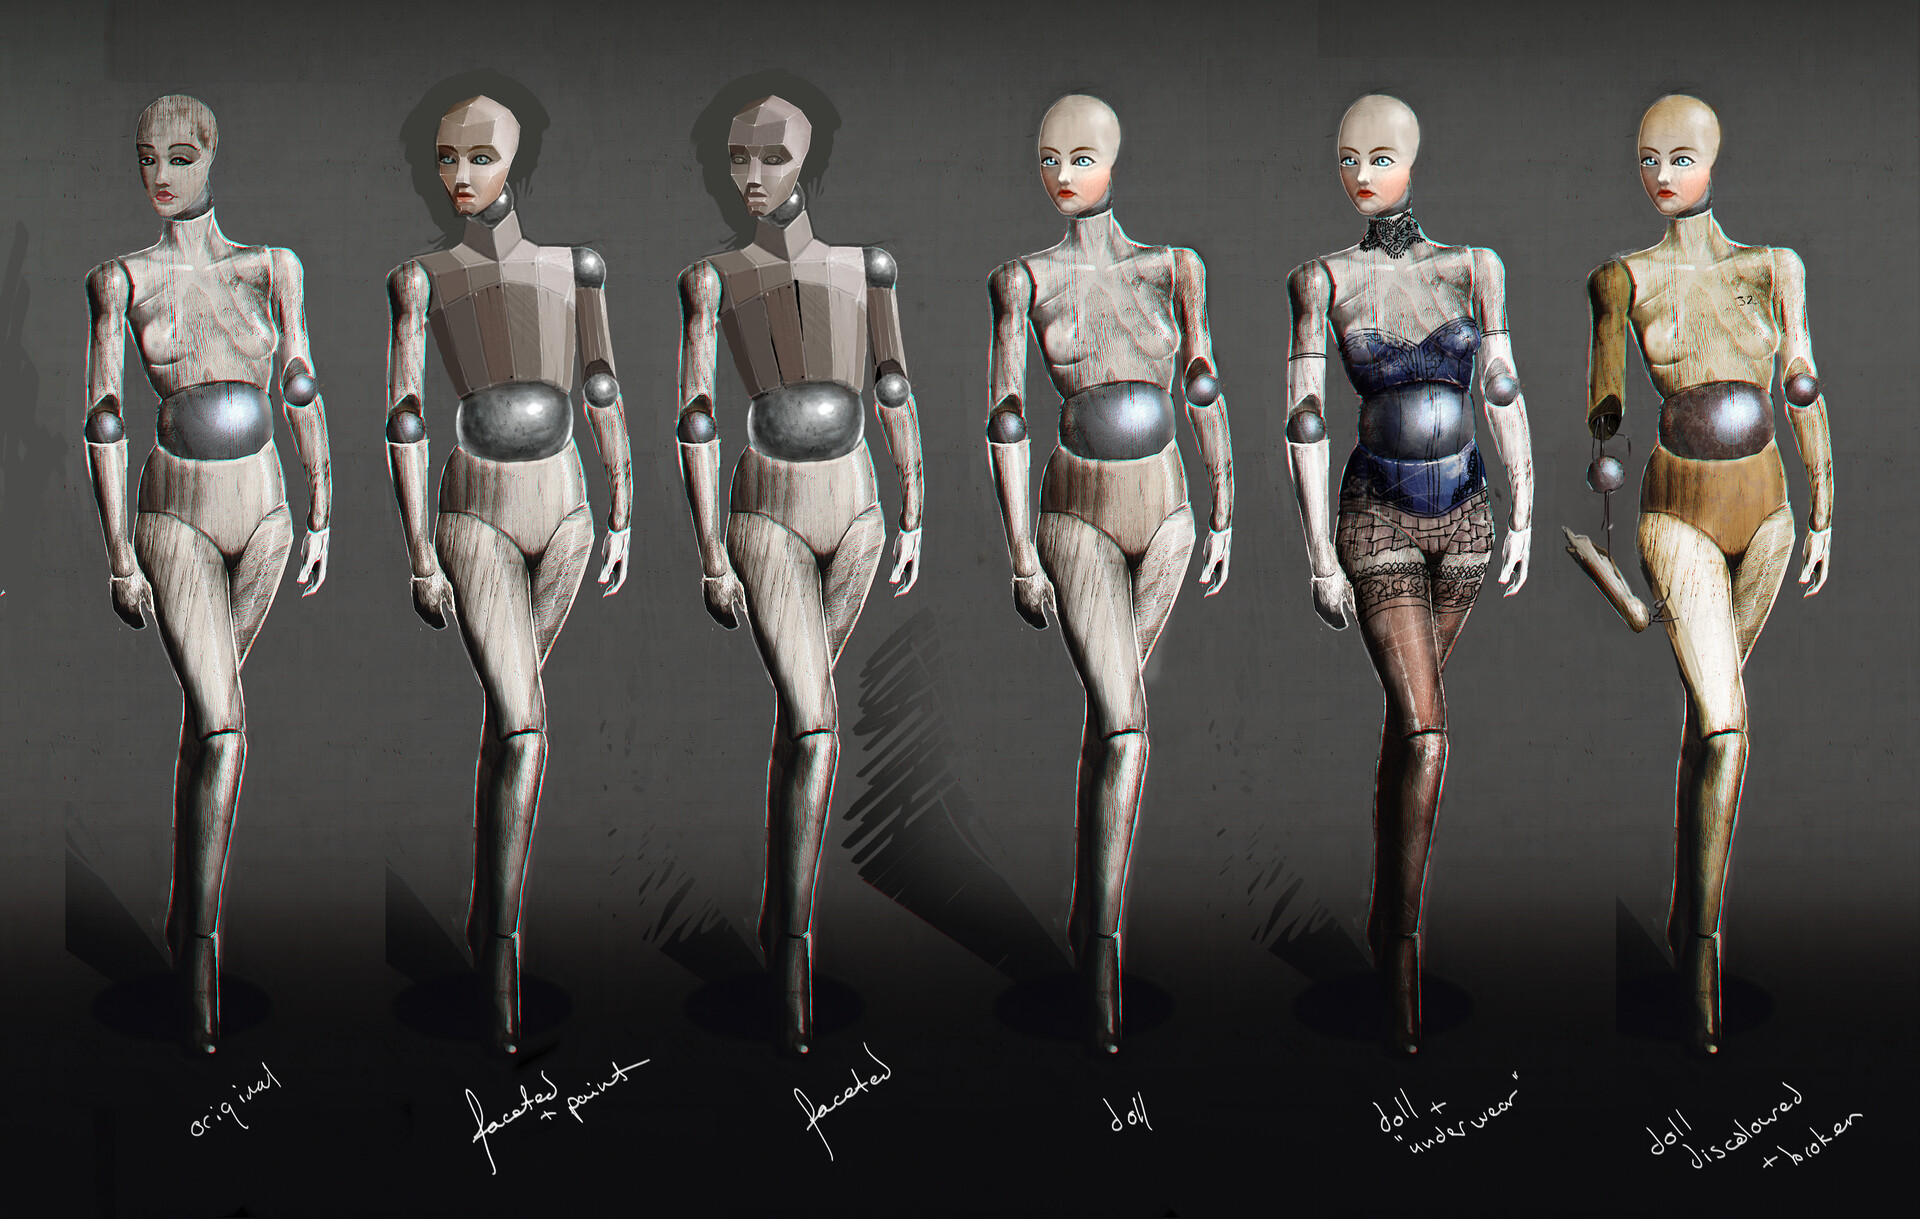 Fatih gurdal mannequin2